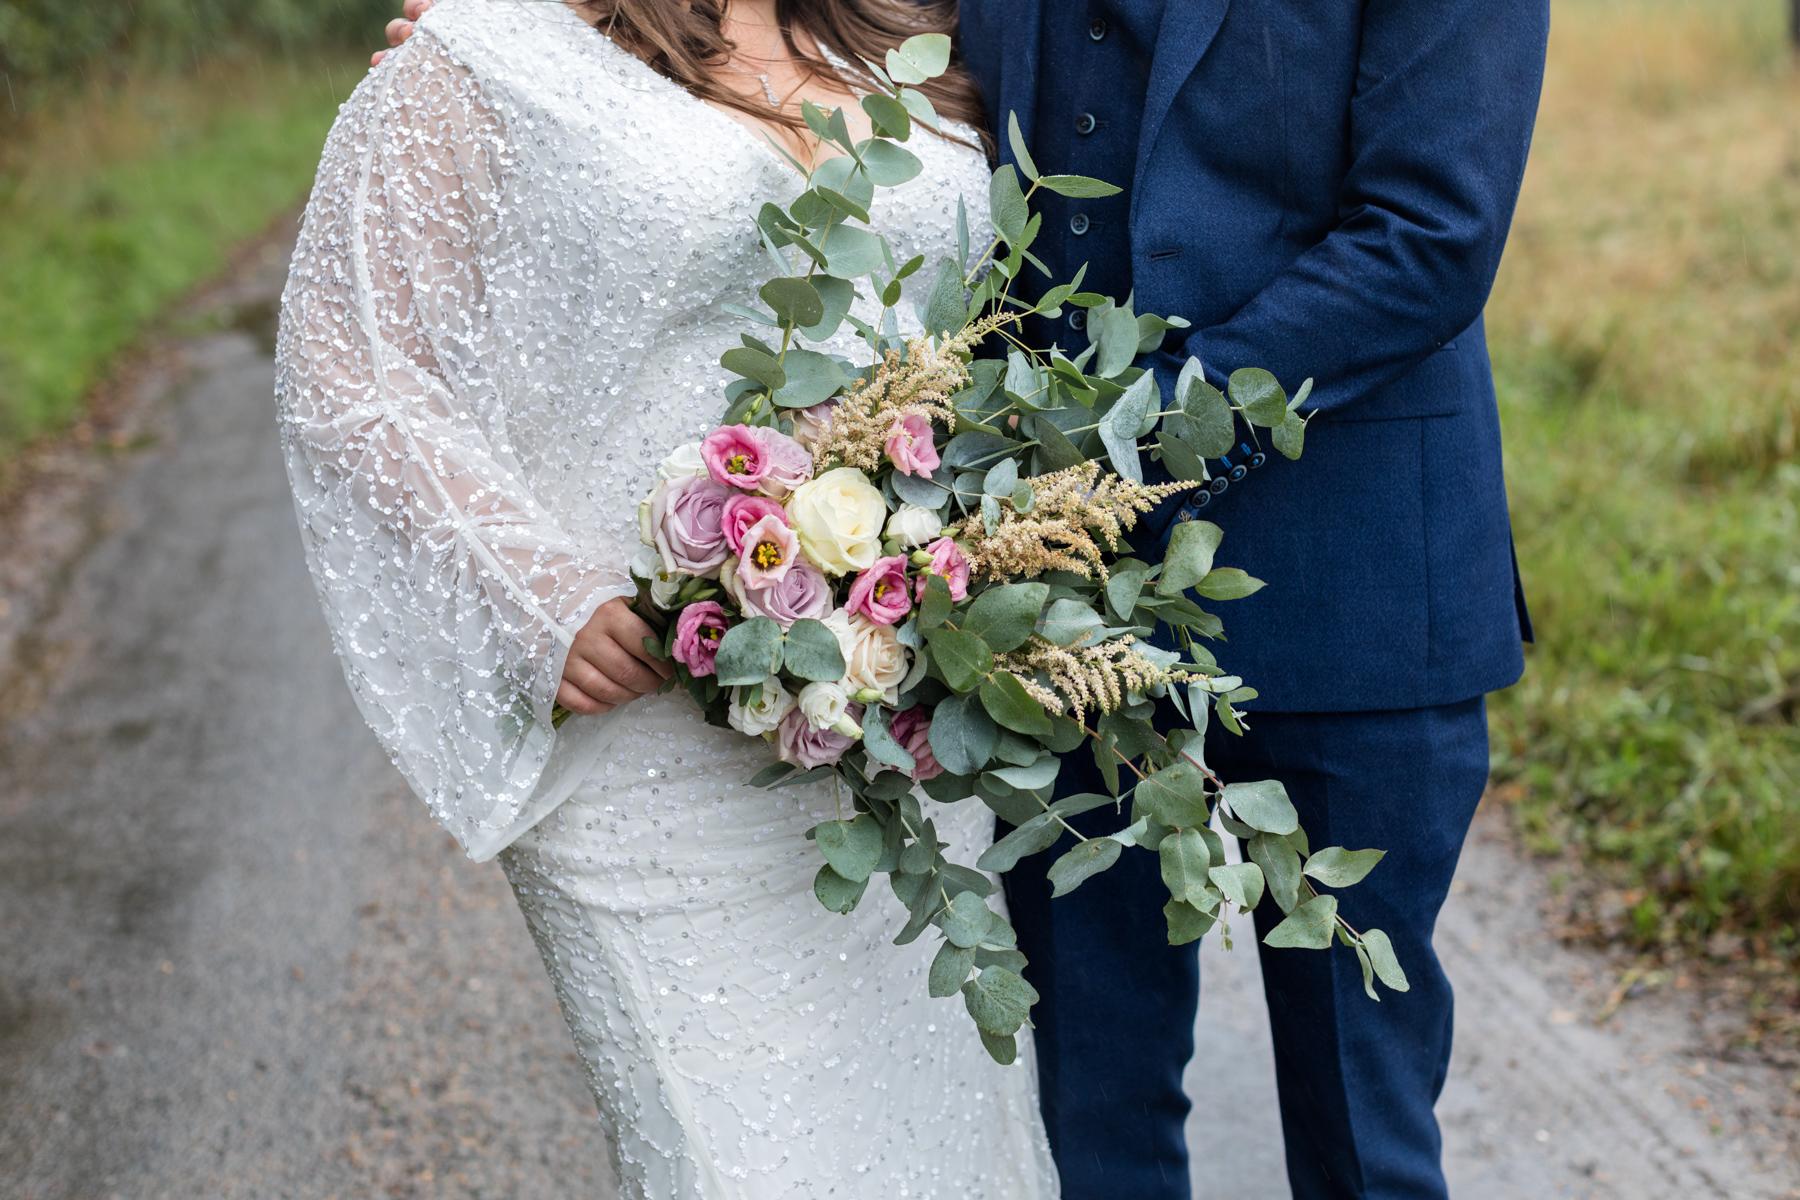 Bride's homemade bouquet